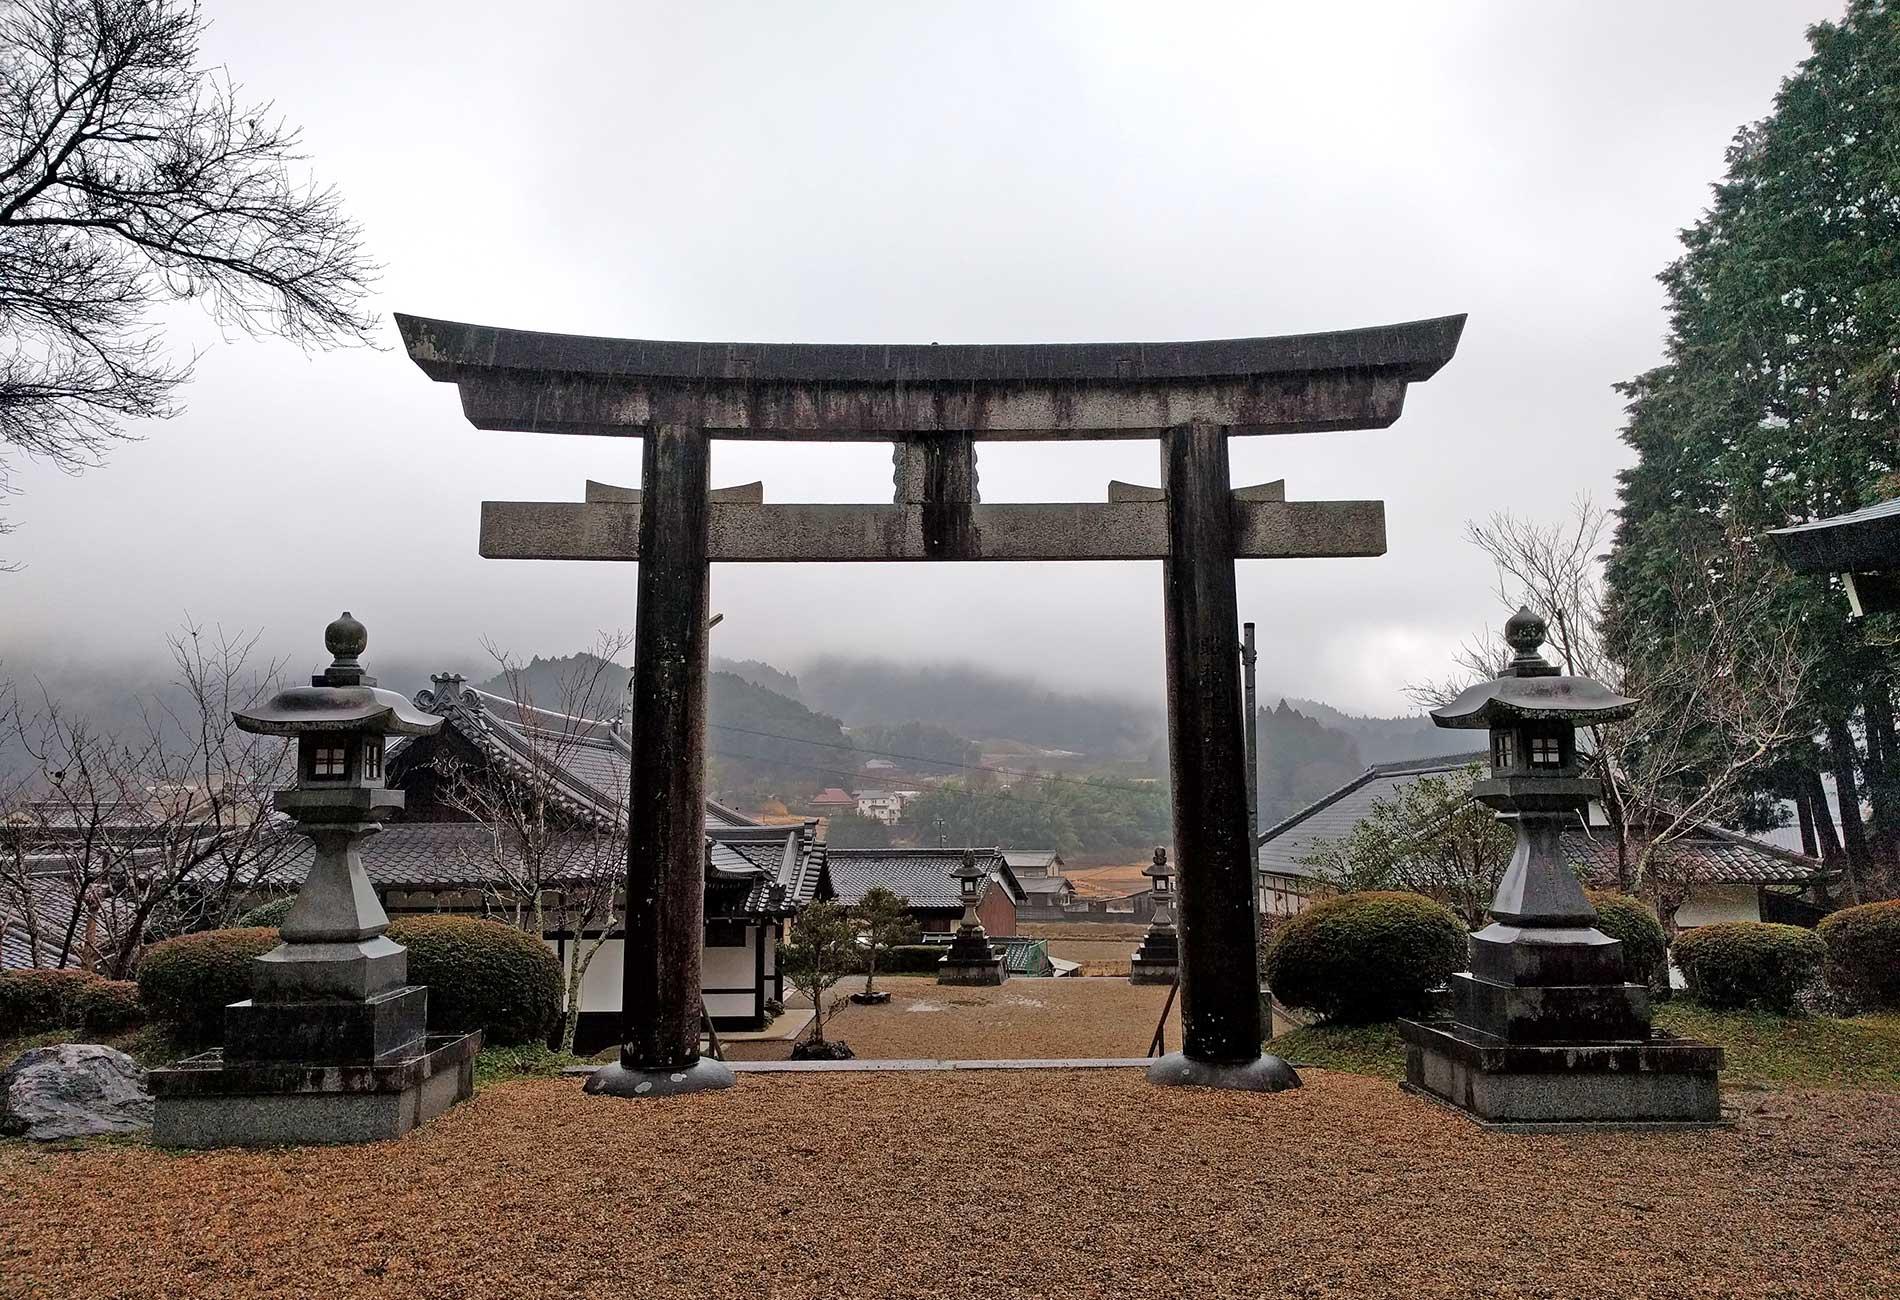 Torii at Yatagarasu Shrine / 八咫烏神社